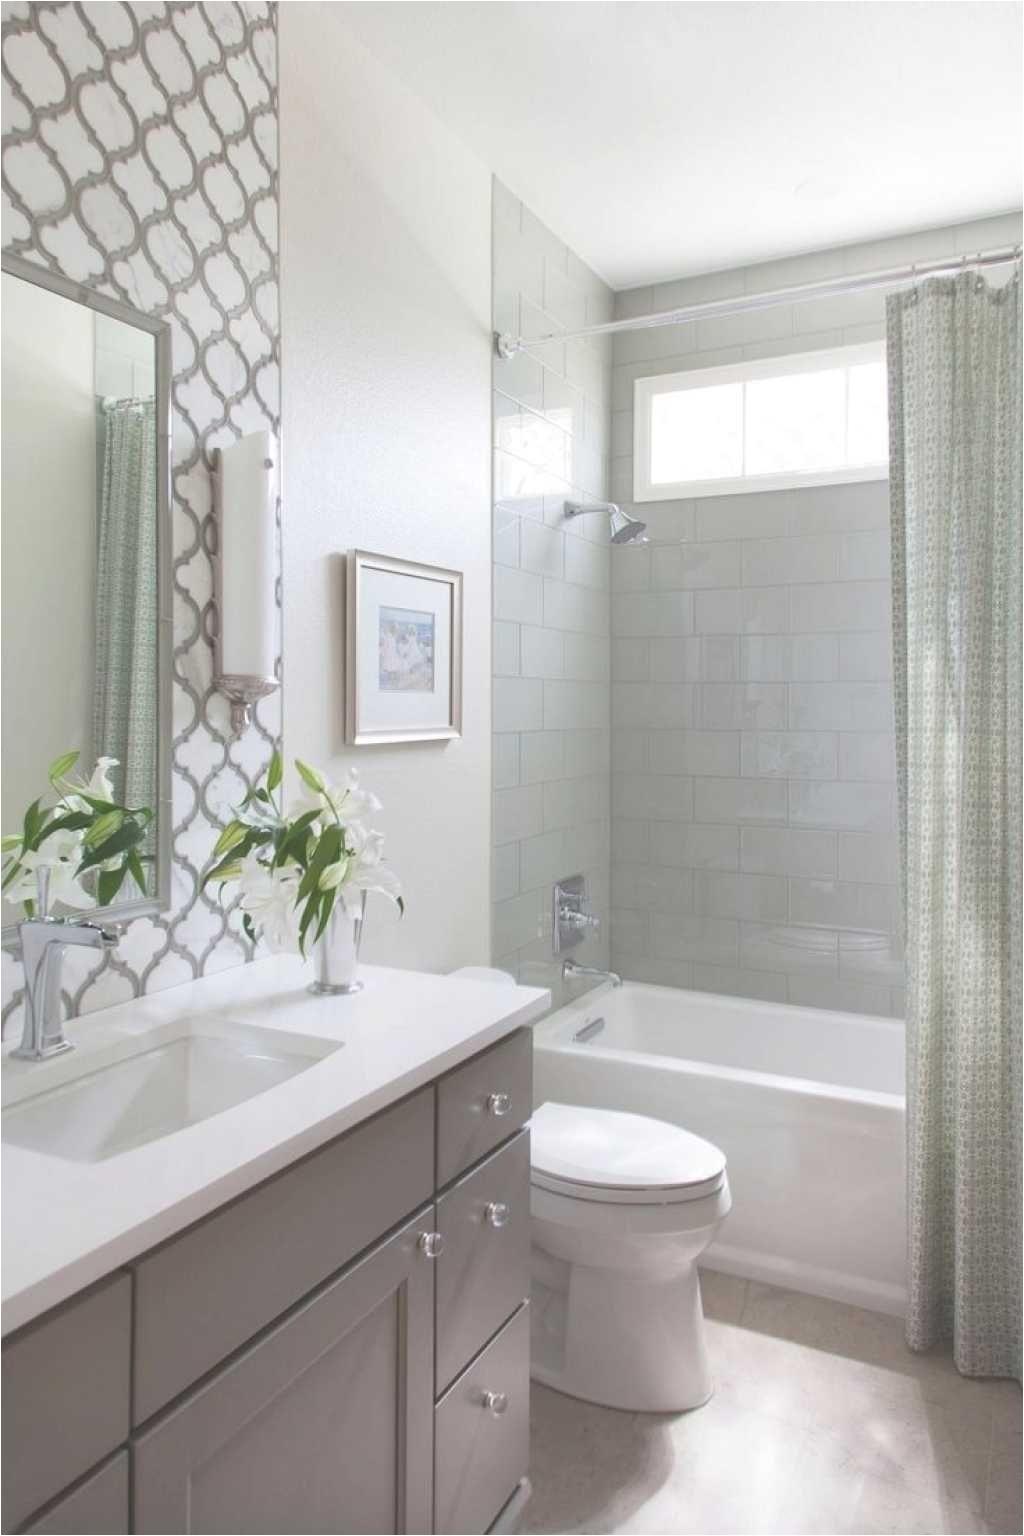 Bathtub Tile Surround Ideas Pin by Architecture Design Magz On Bathroom Design Ideas Pinterest